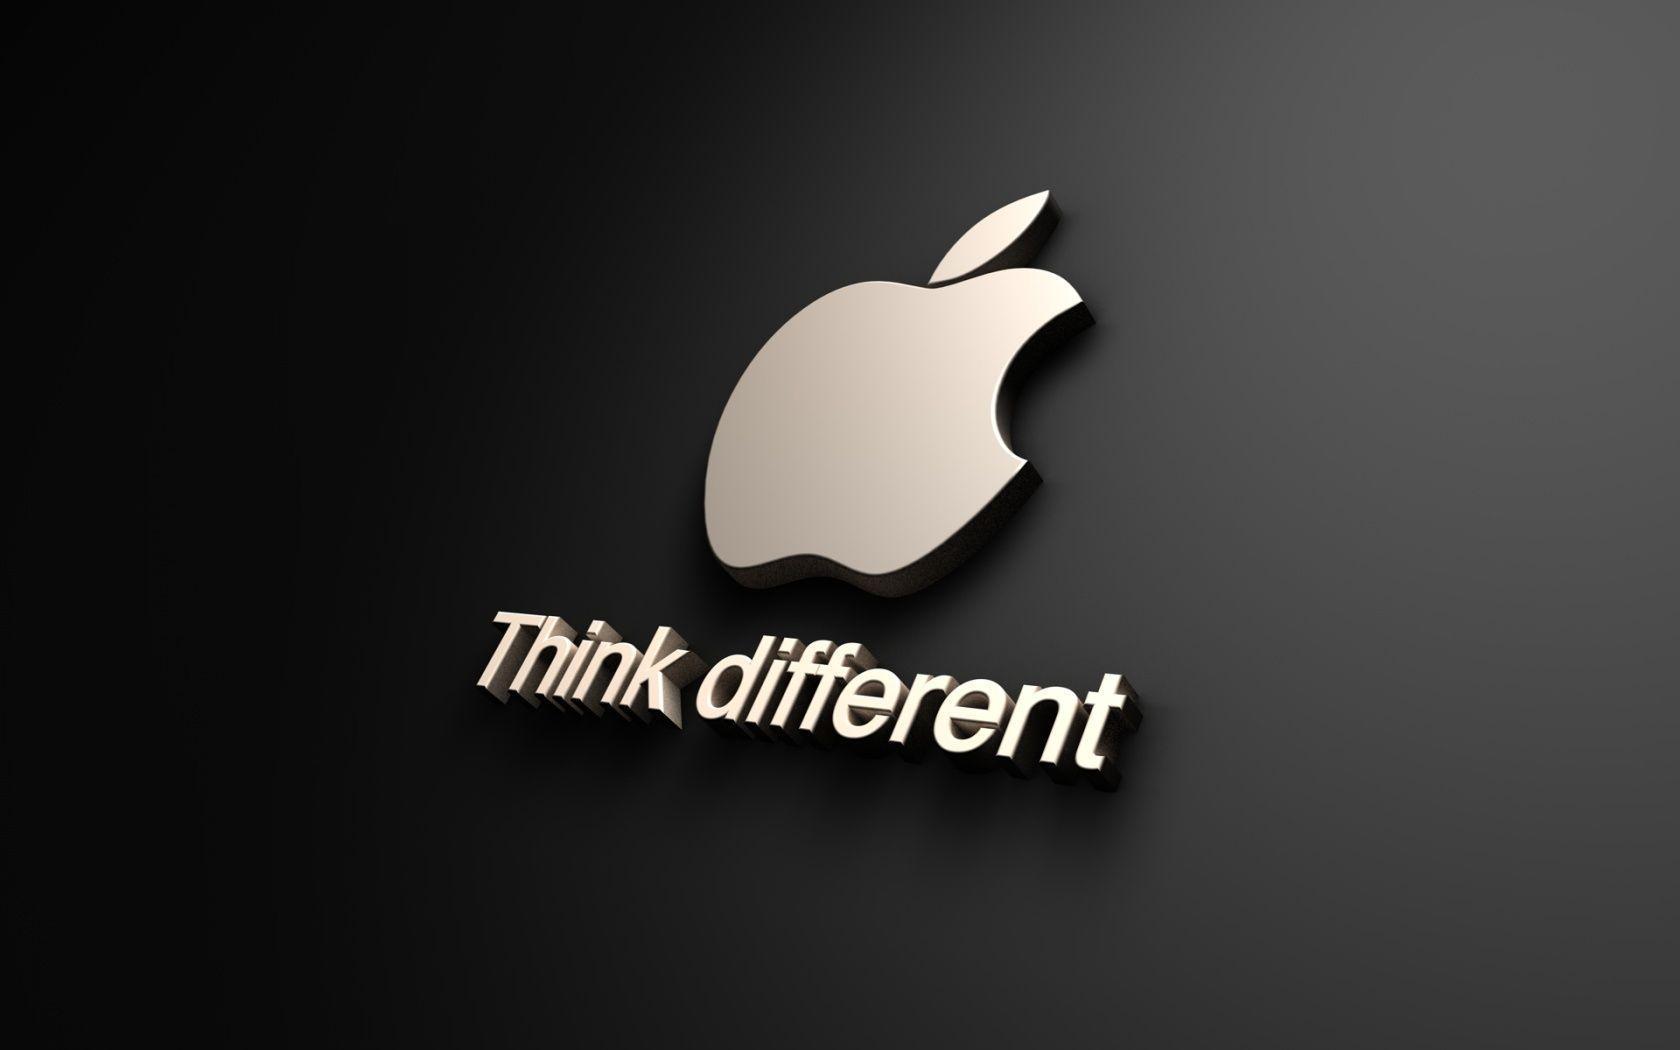 140+ Top outstanding Apple Wallpaper pictures